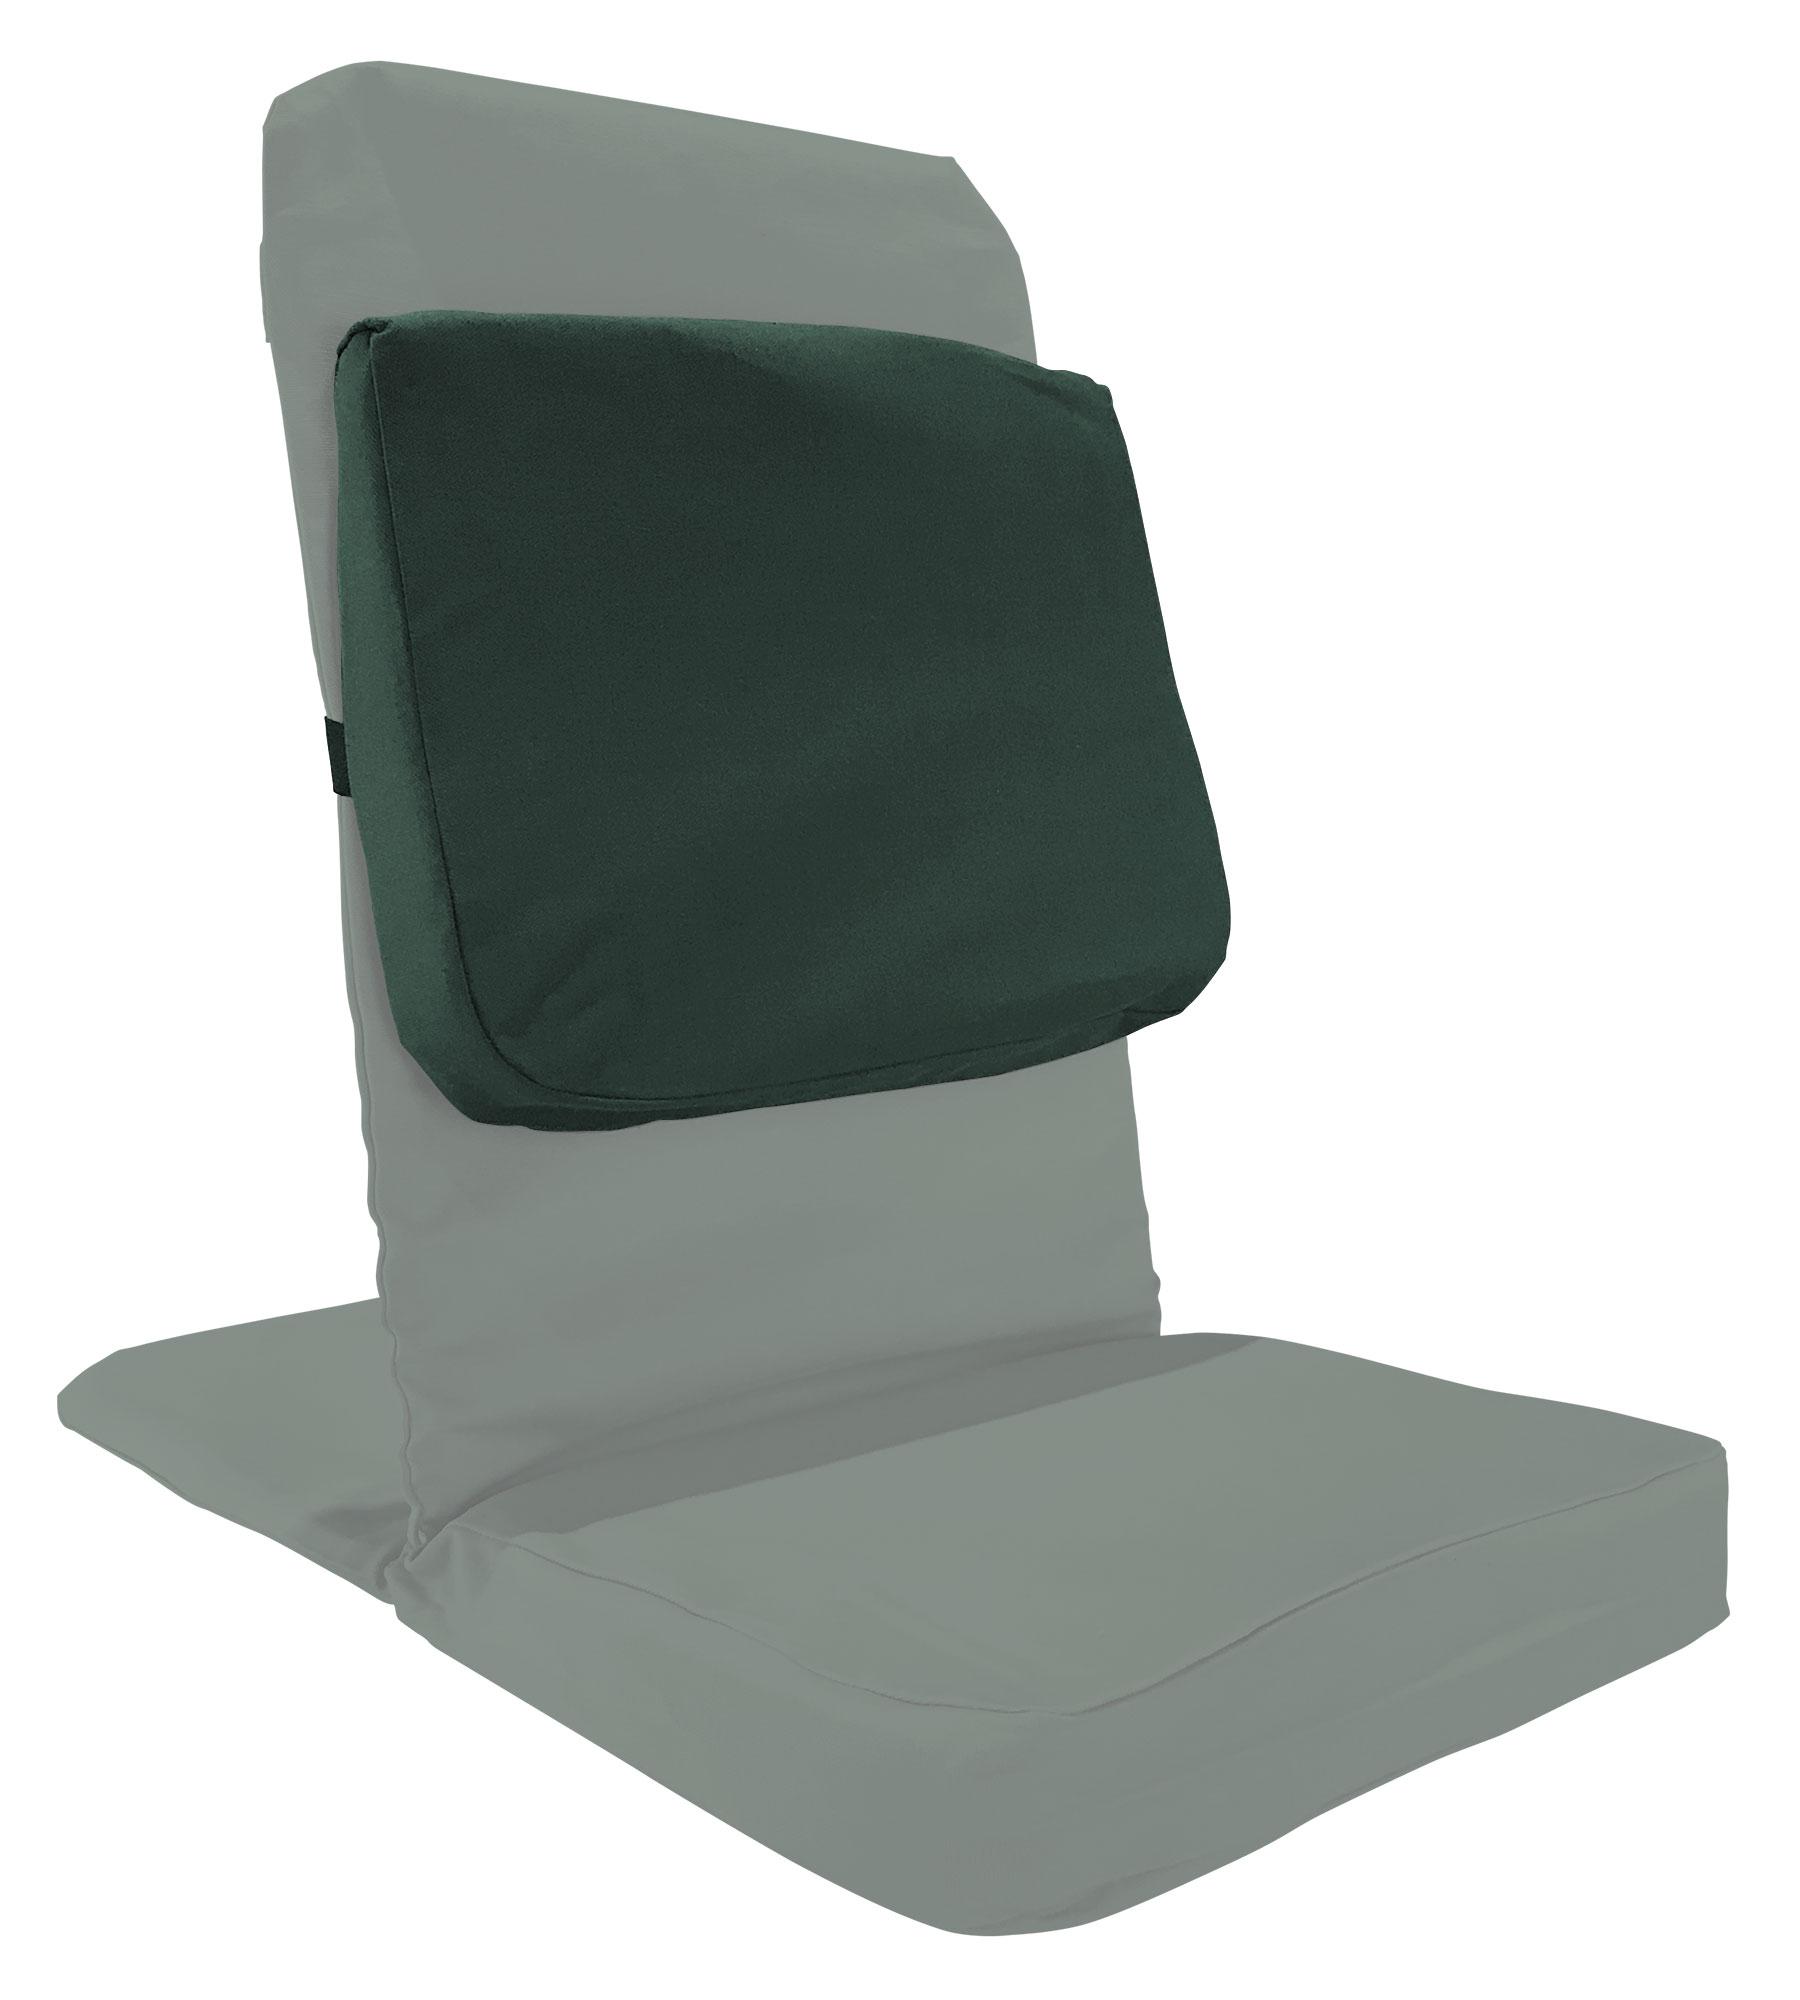 BackJack Regular Chair Cushion  FloorSeatingcom